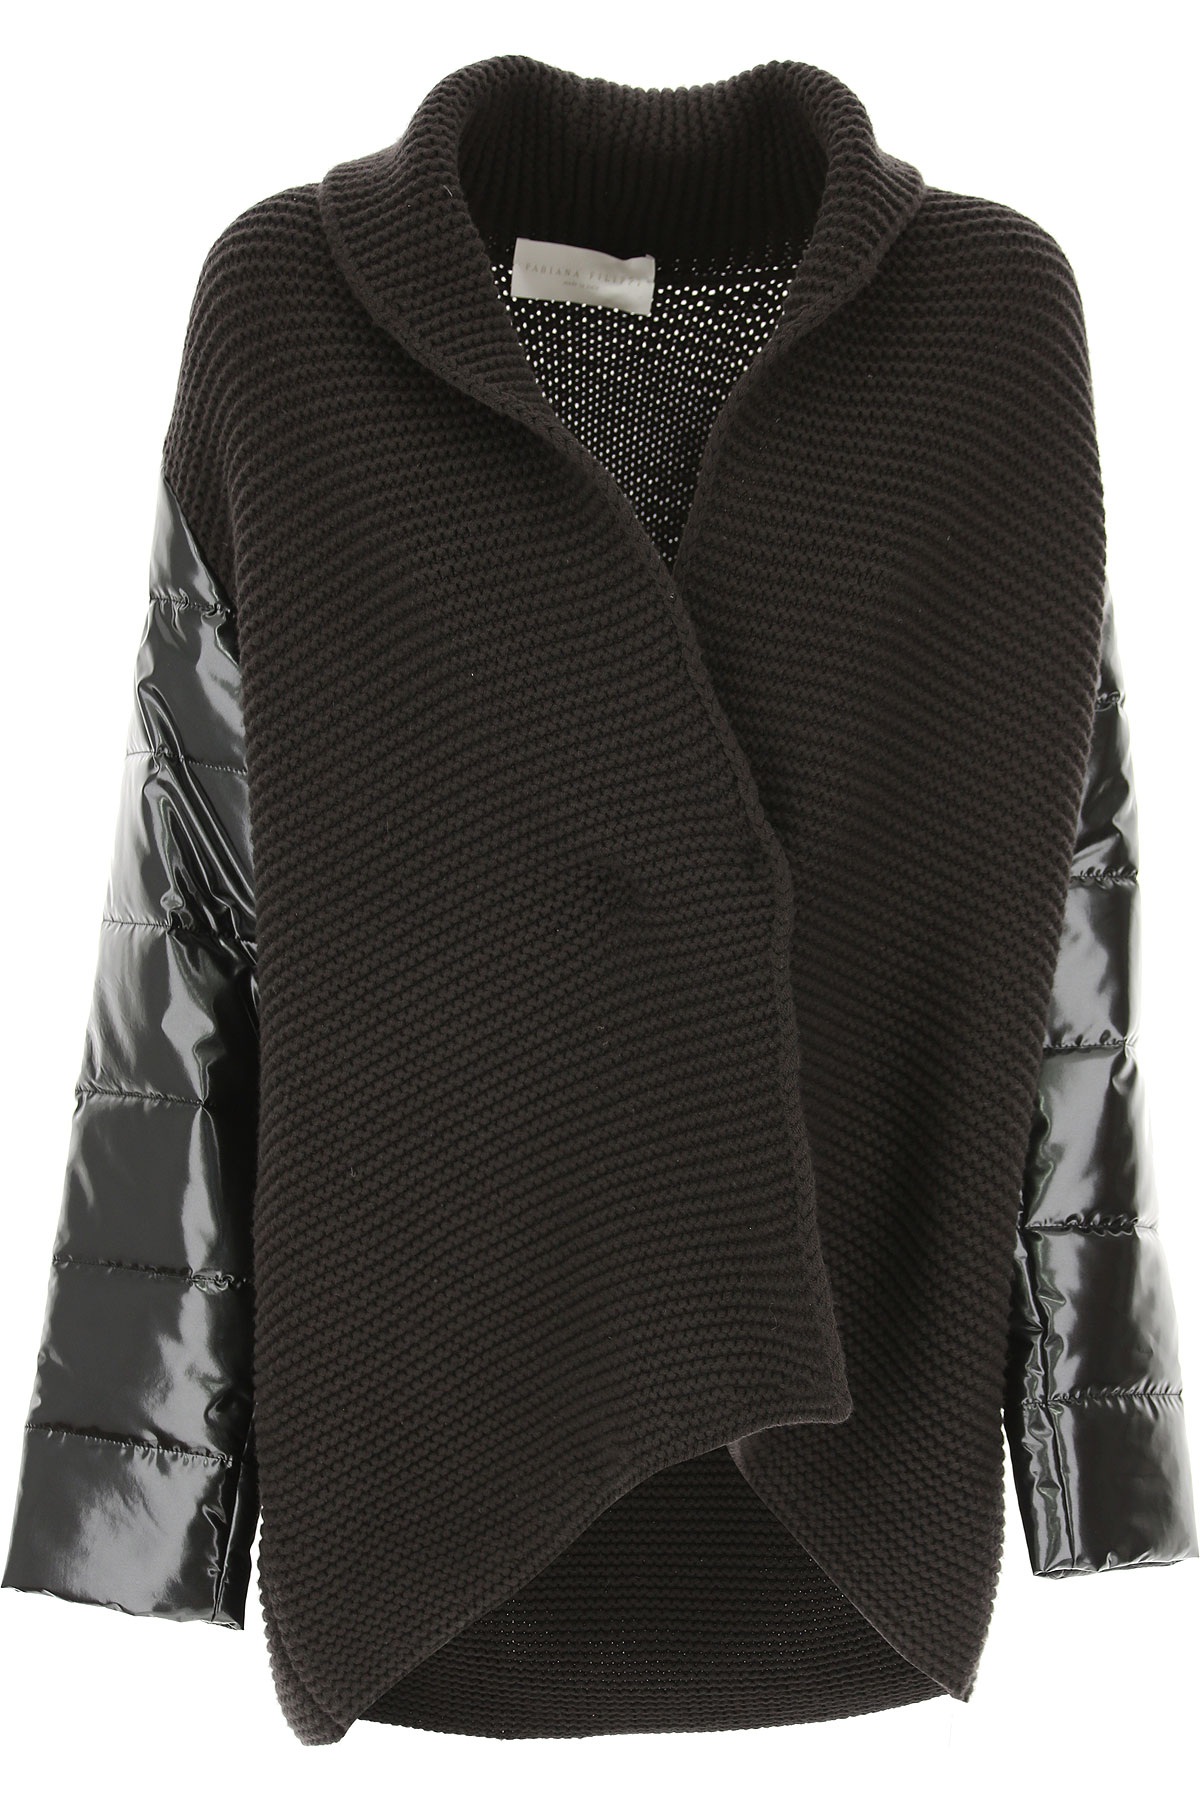 Image of Fabiana Filippi Jacket for Women, Grey, merino wool, 2017, 4 6 8